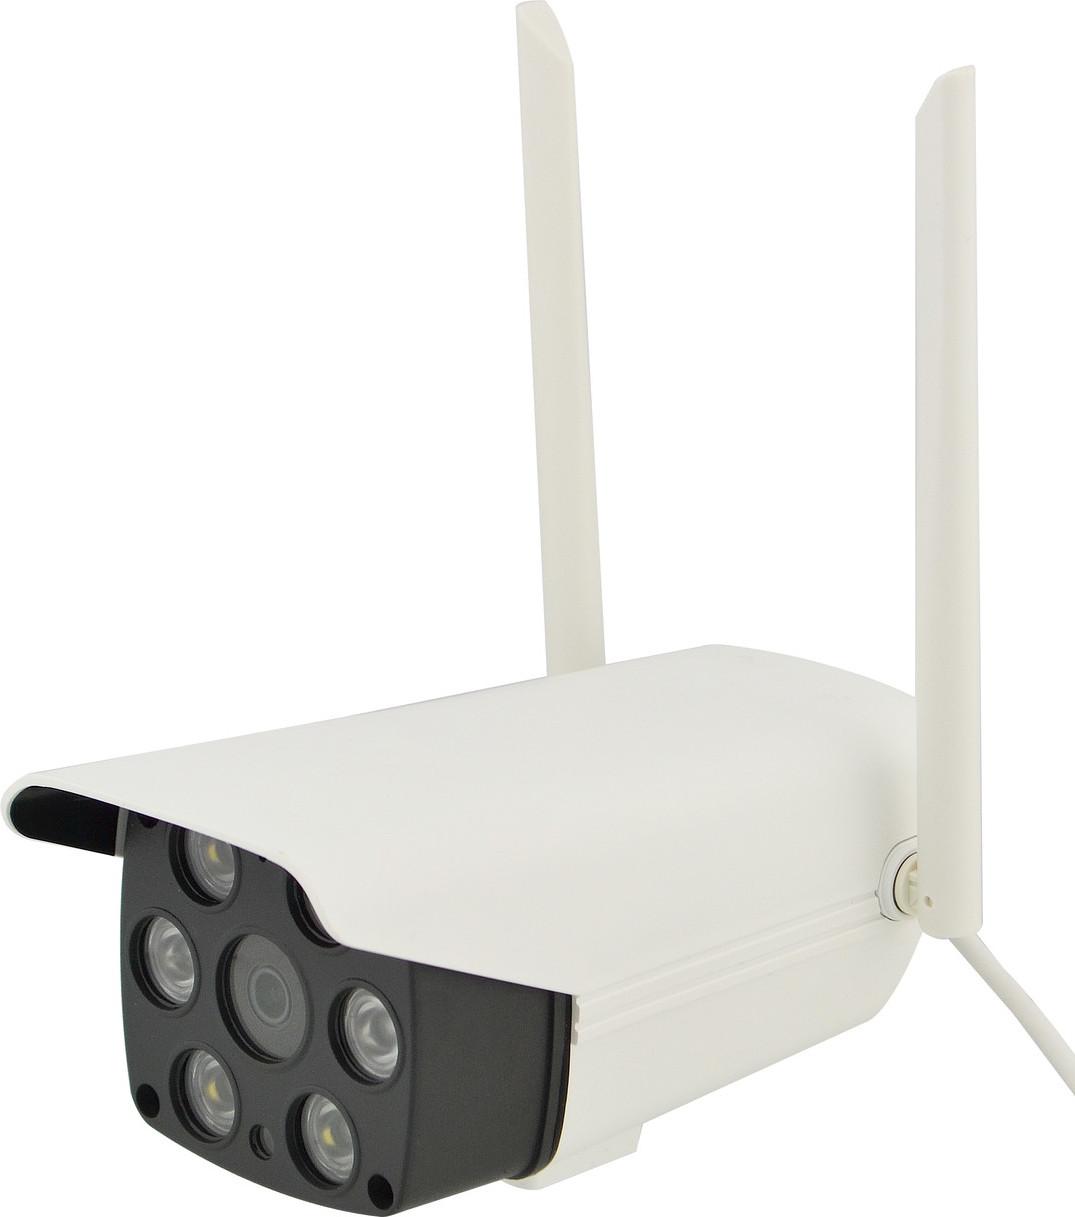 Уличная IP камера видеонаблюдения TF2-C20Y-AP 4мм Wi-Fi 2.1 mp (14066)